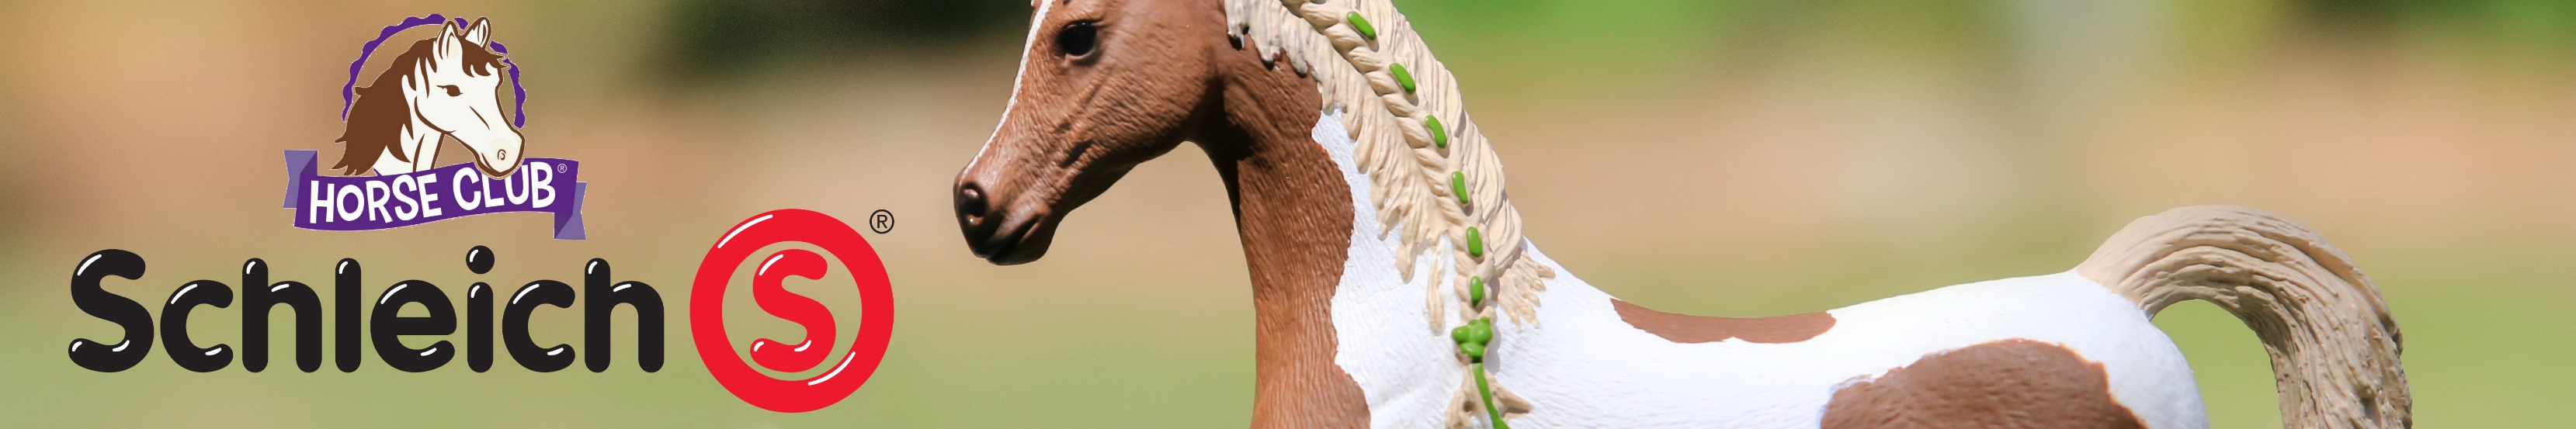 schleich-horse-club-pintabians.jpg